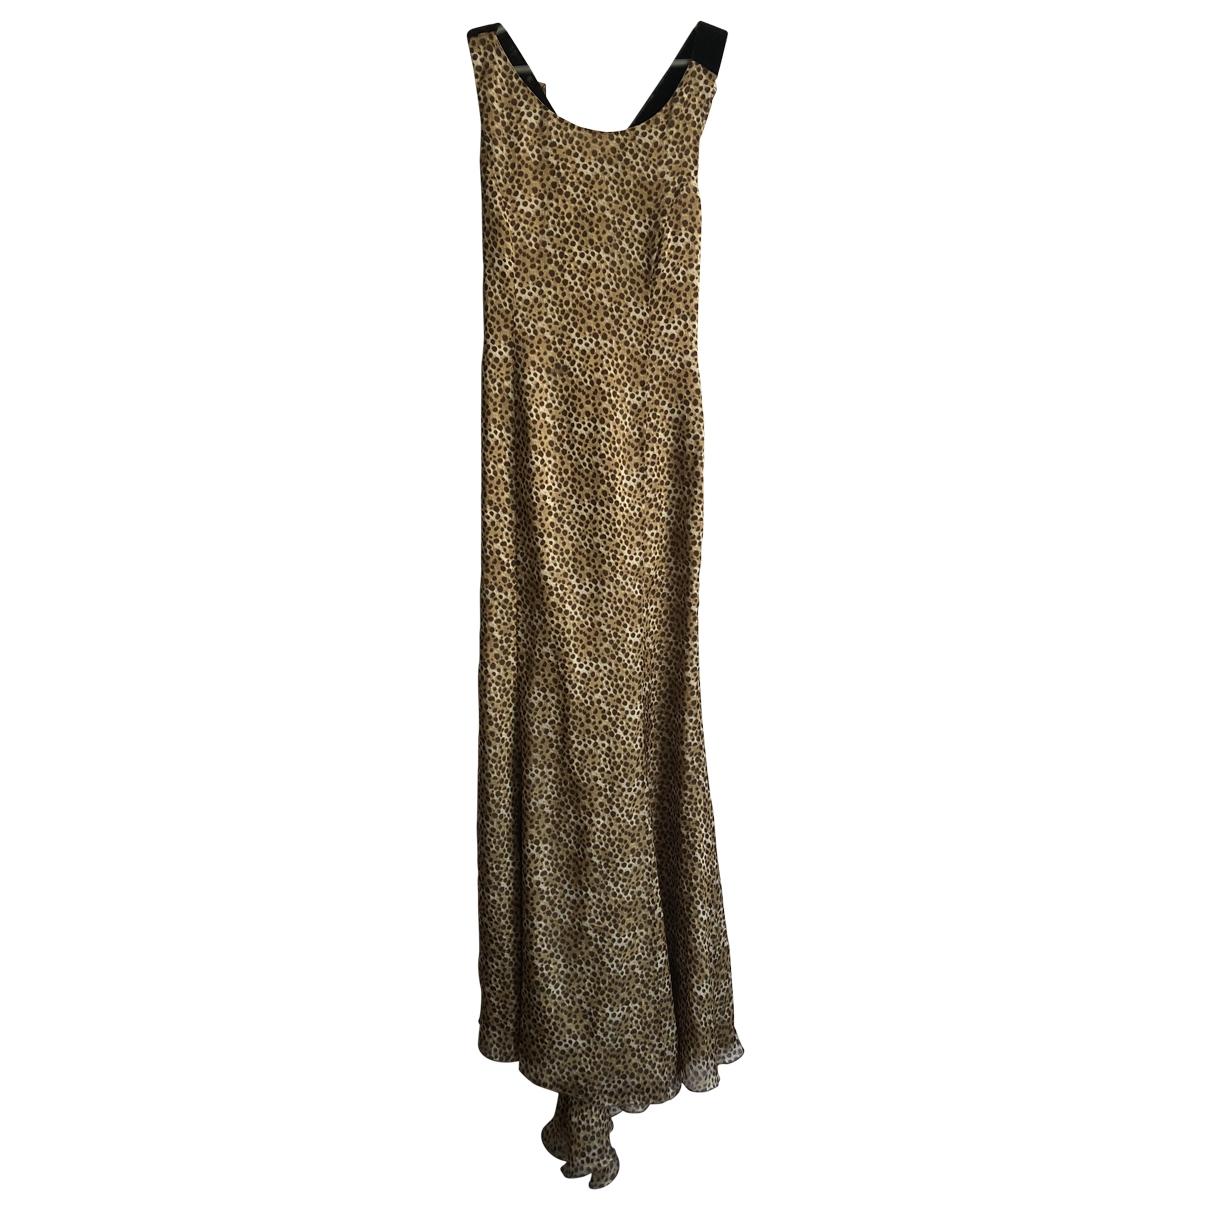 Valentino Garavani - Robe   pour femme en soie - multicolore